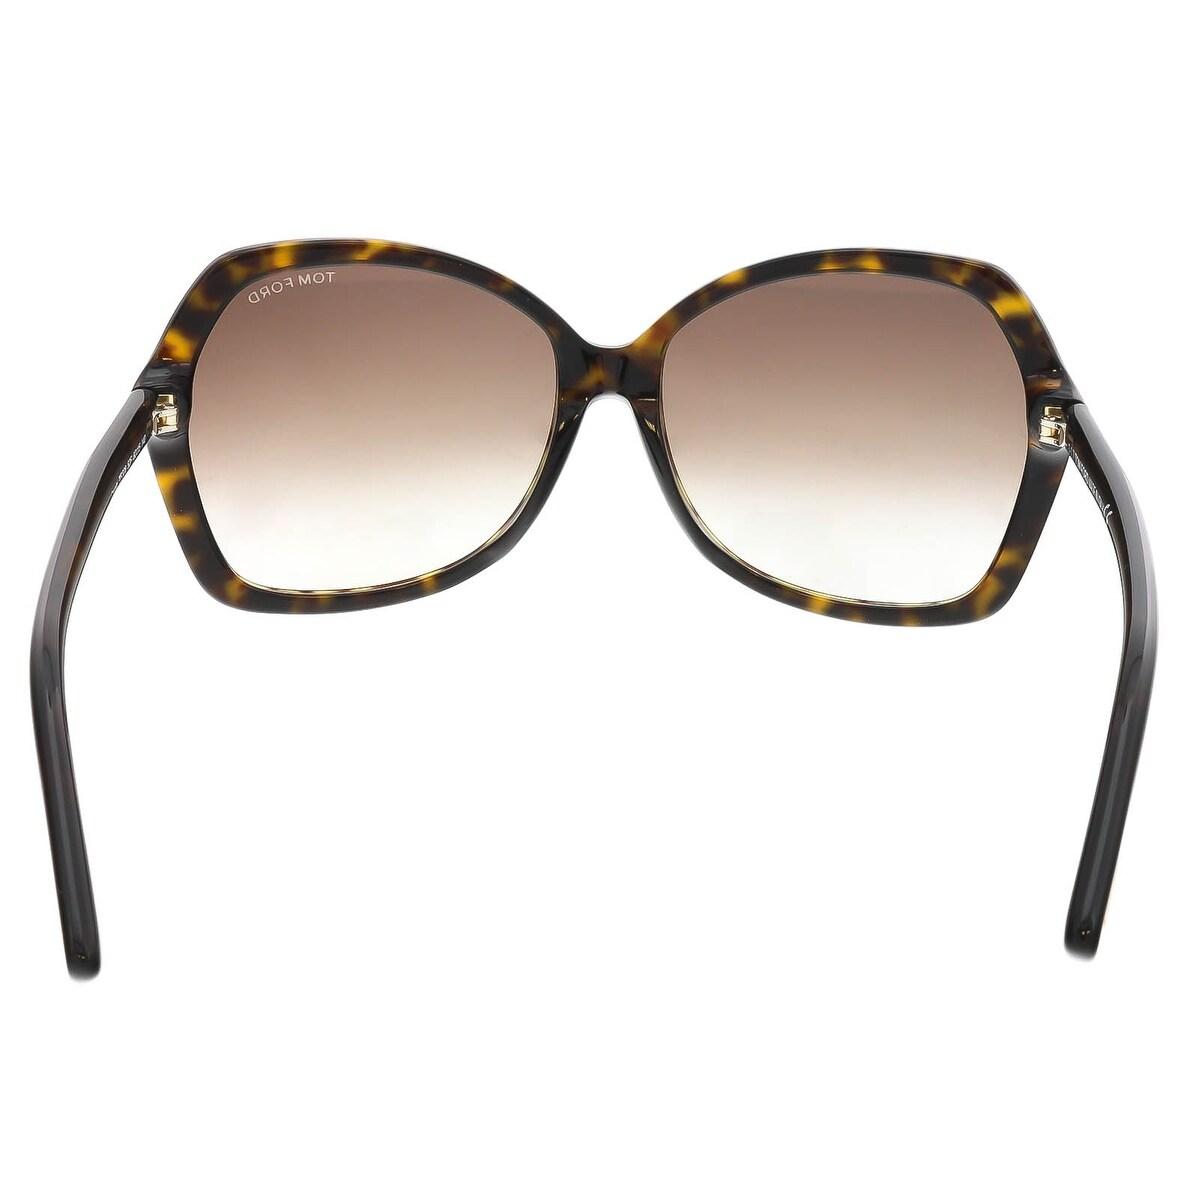 9fd9a96ff747 Shop Tom Ford FT0328 S 52F CAROLA Havana Square Sunglasses - Free Shipping  Today - Overstock.com - 23005303